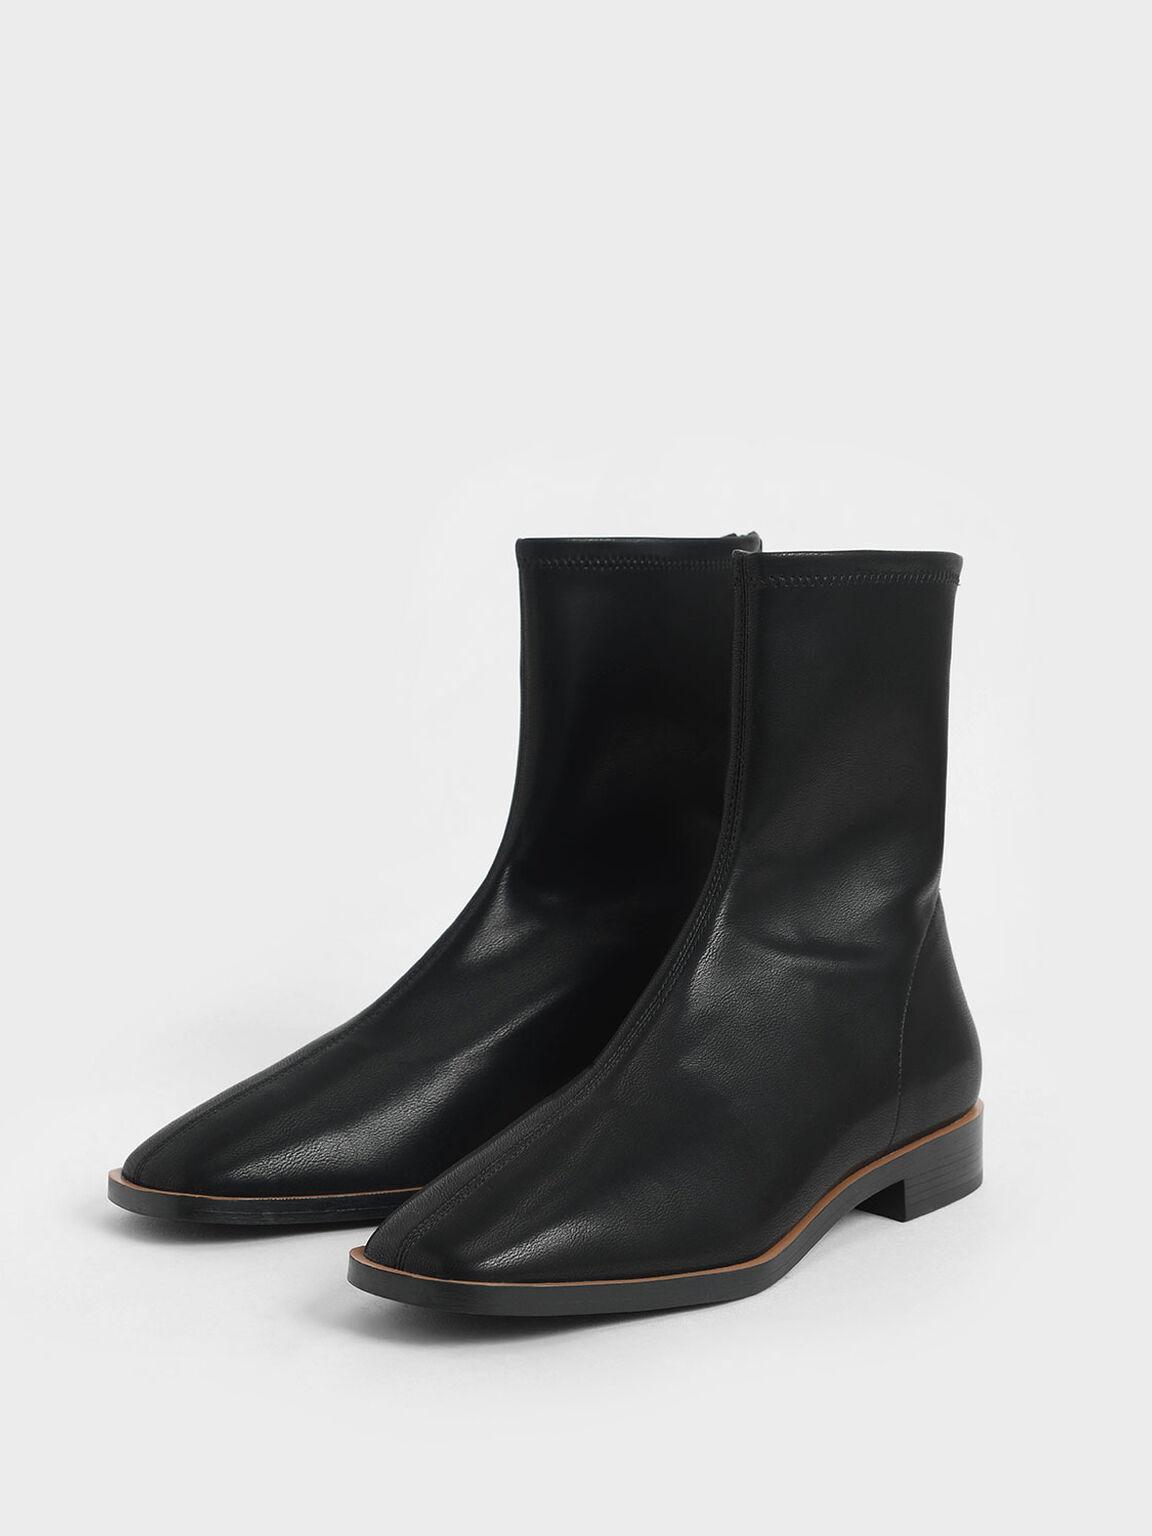 Zip Ankle Boots, Black, hi-res